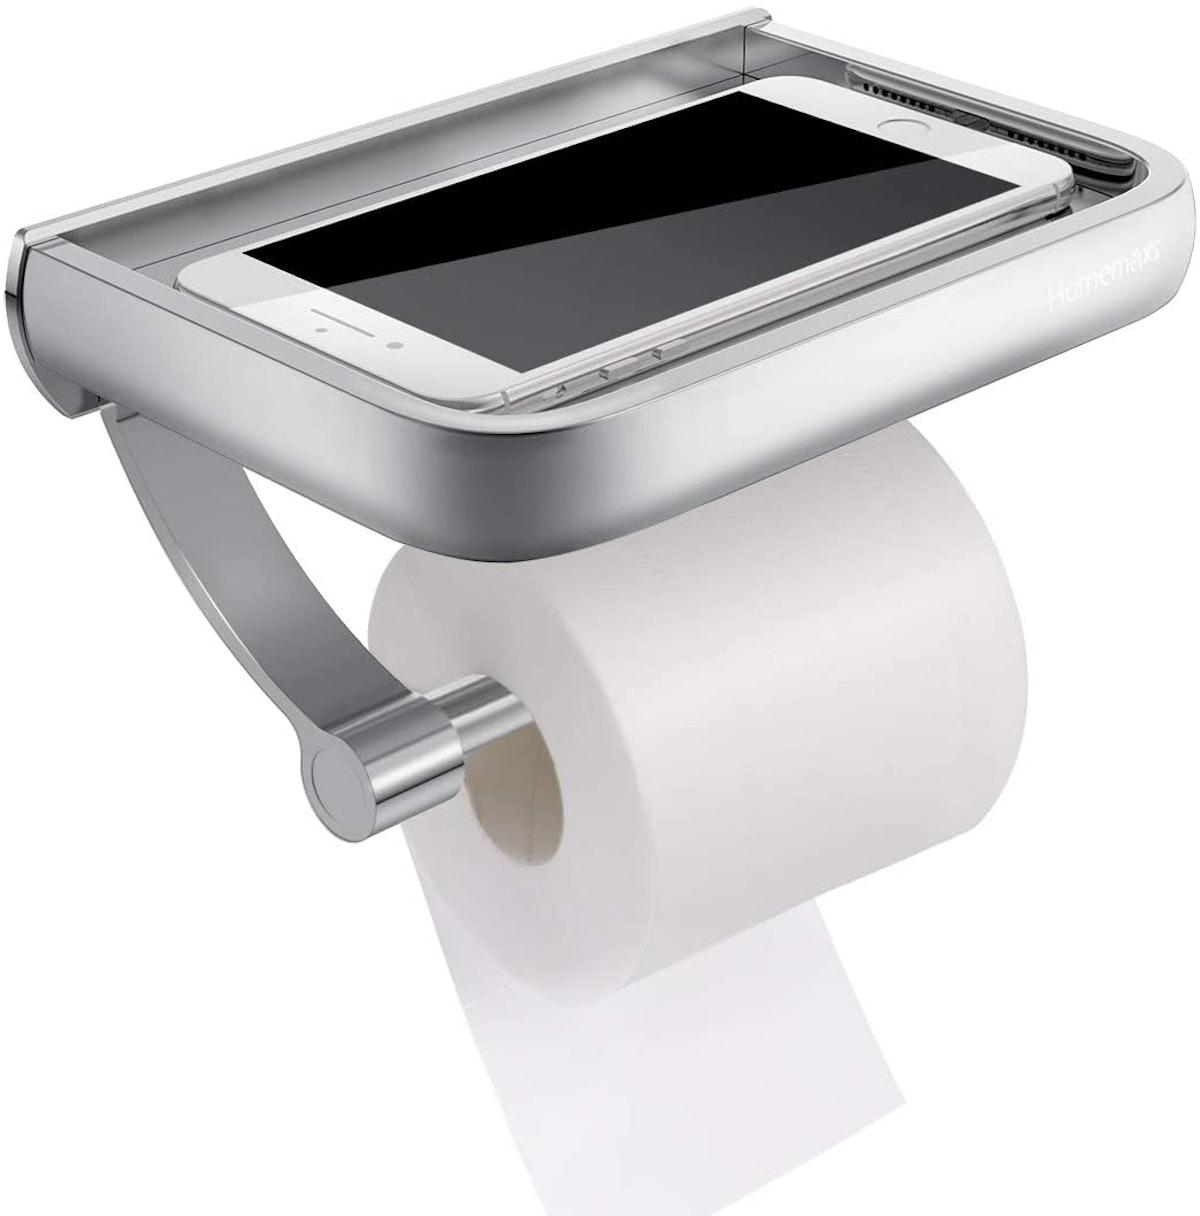 Homemaxs Toilet Paper Holder with Shelf